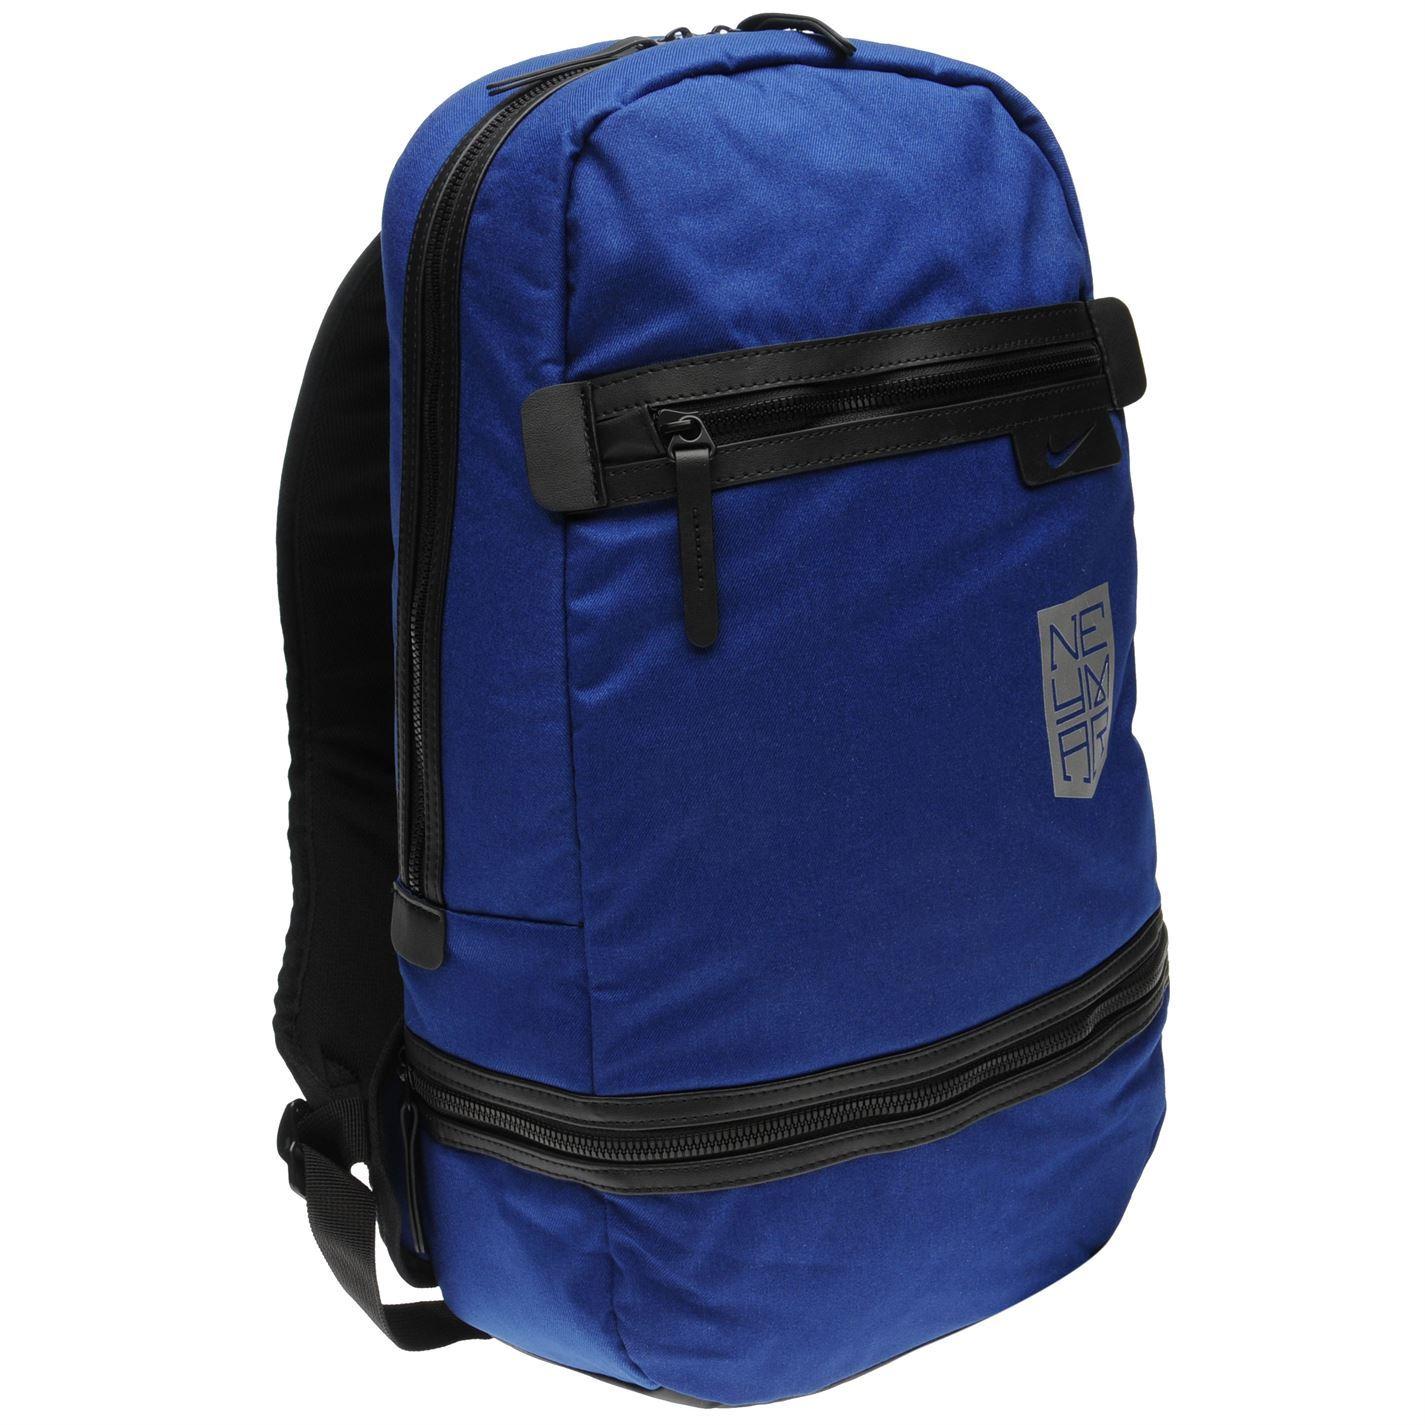 fc6dd07860f4 Nike Neymar Backpack Royal Blue Sports Gym Bag Rucksack Carryall